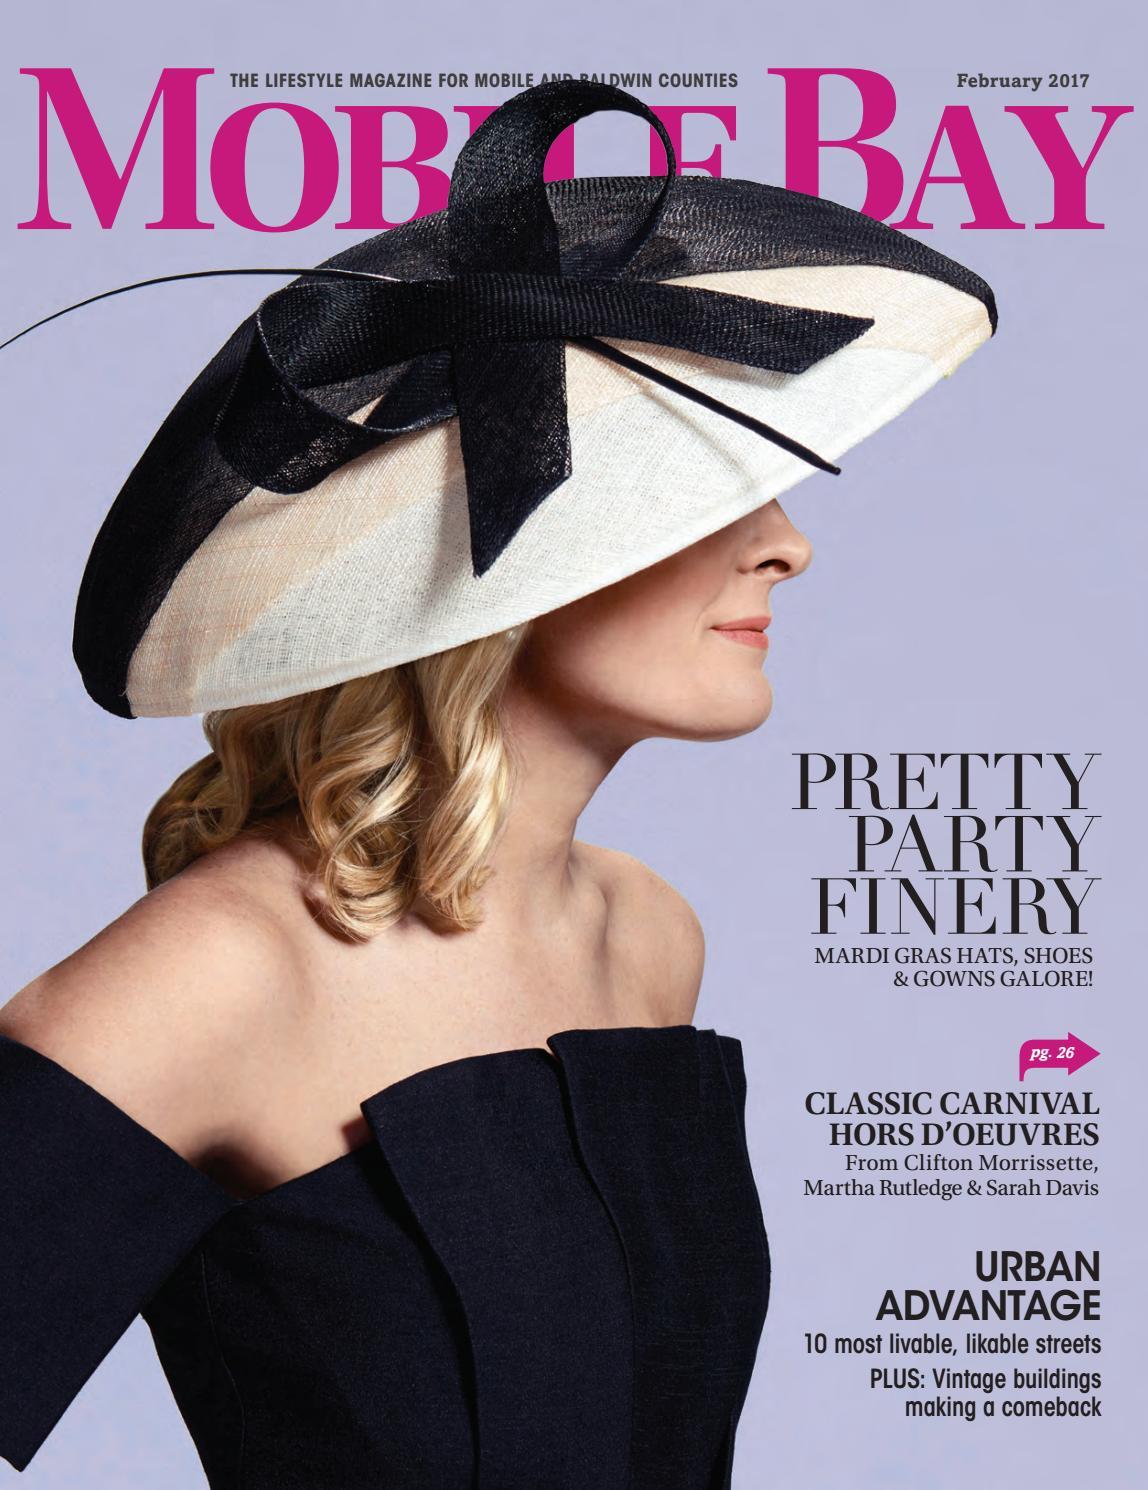 ec4ab55335 Mobile Bay Magazine - February 2017 by Mobile Bay Magazine - issuu